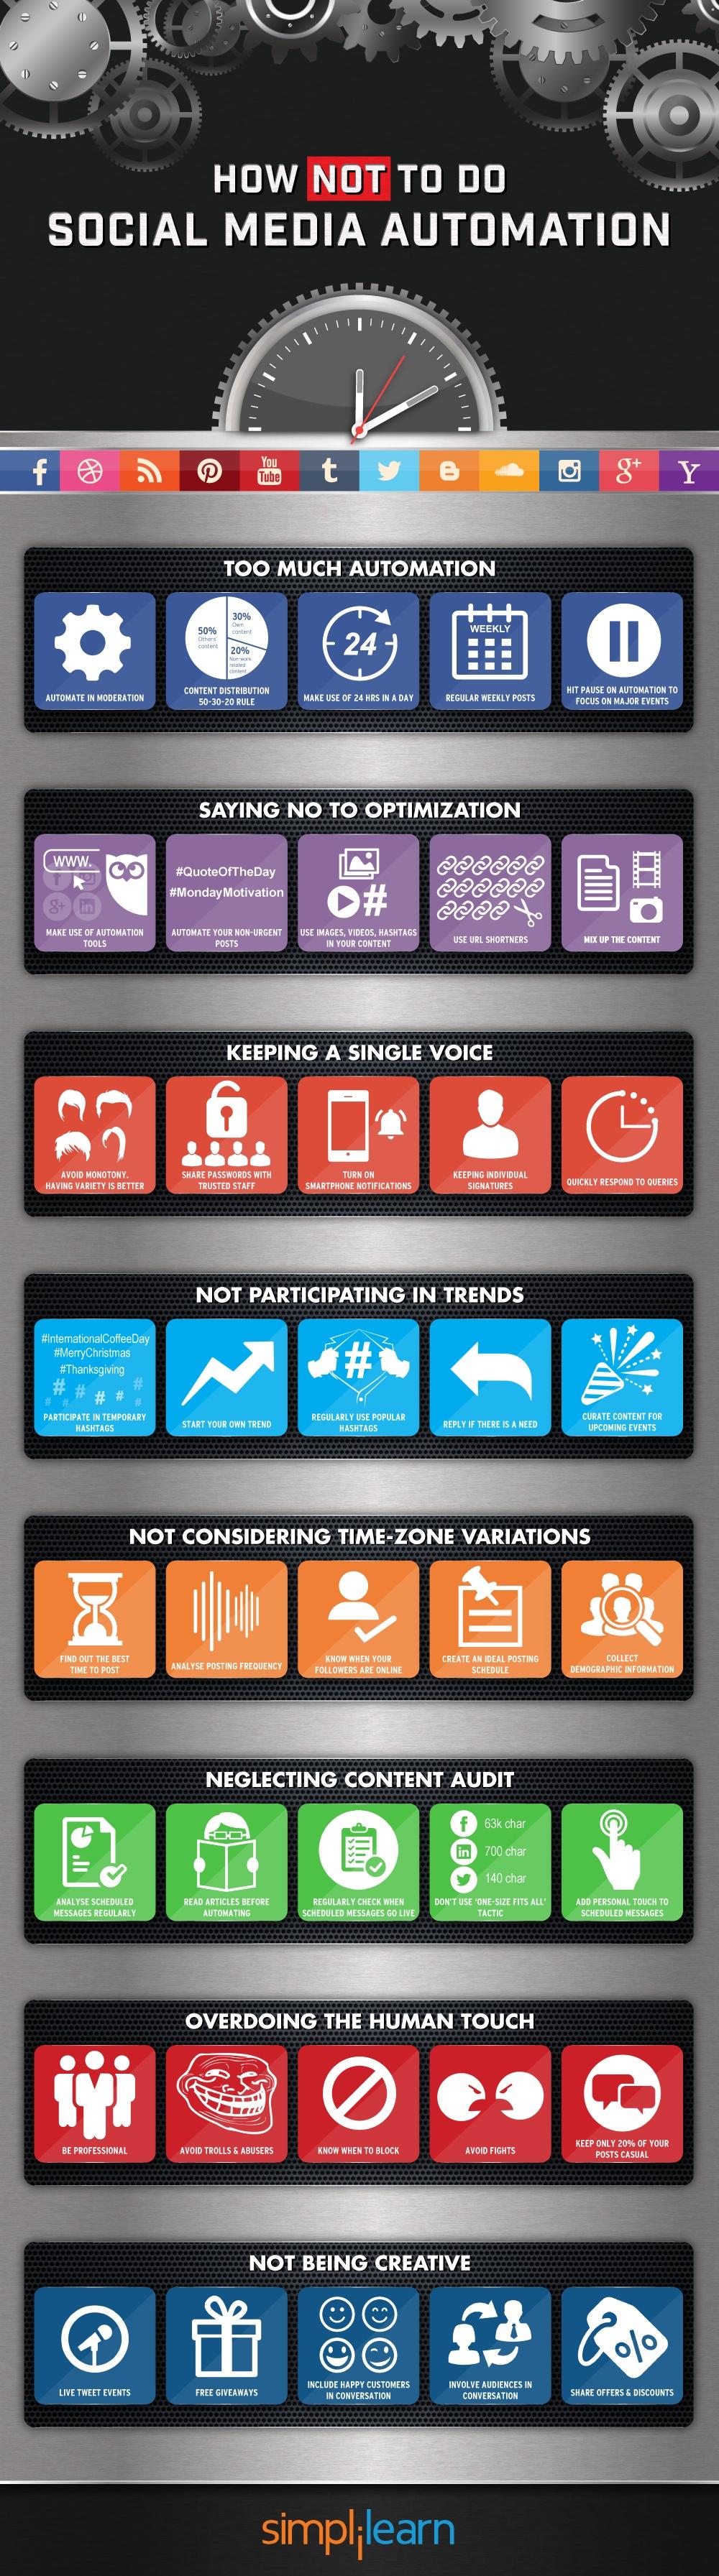 Cómo NO debes automatizar tus Redes Sociales #infografia #infographic #socialmedia